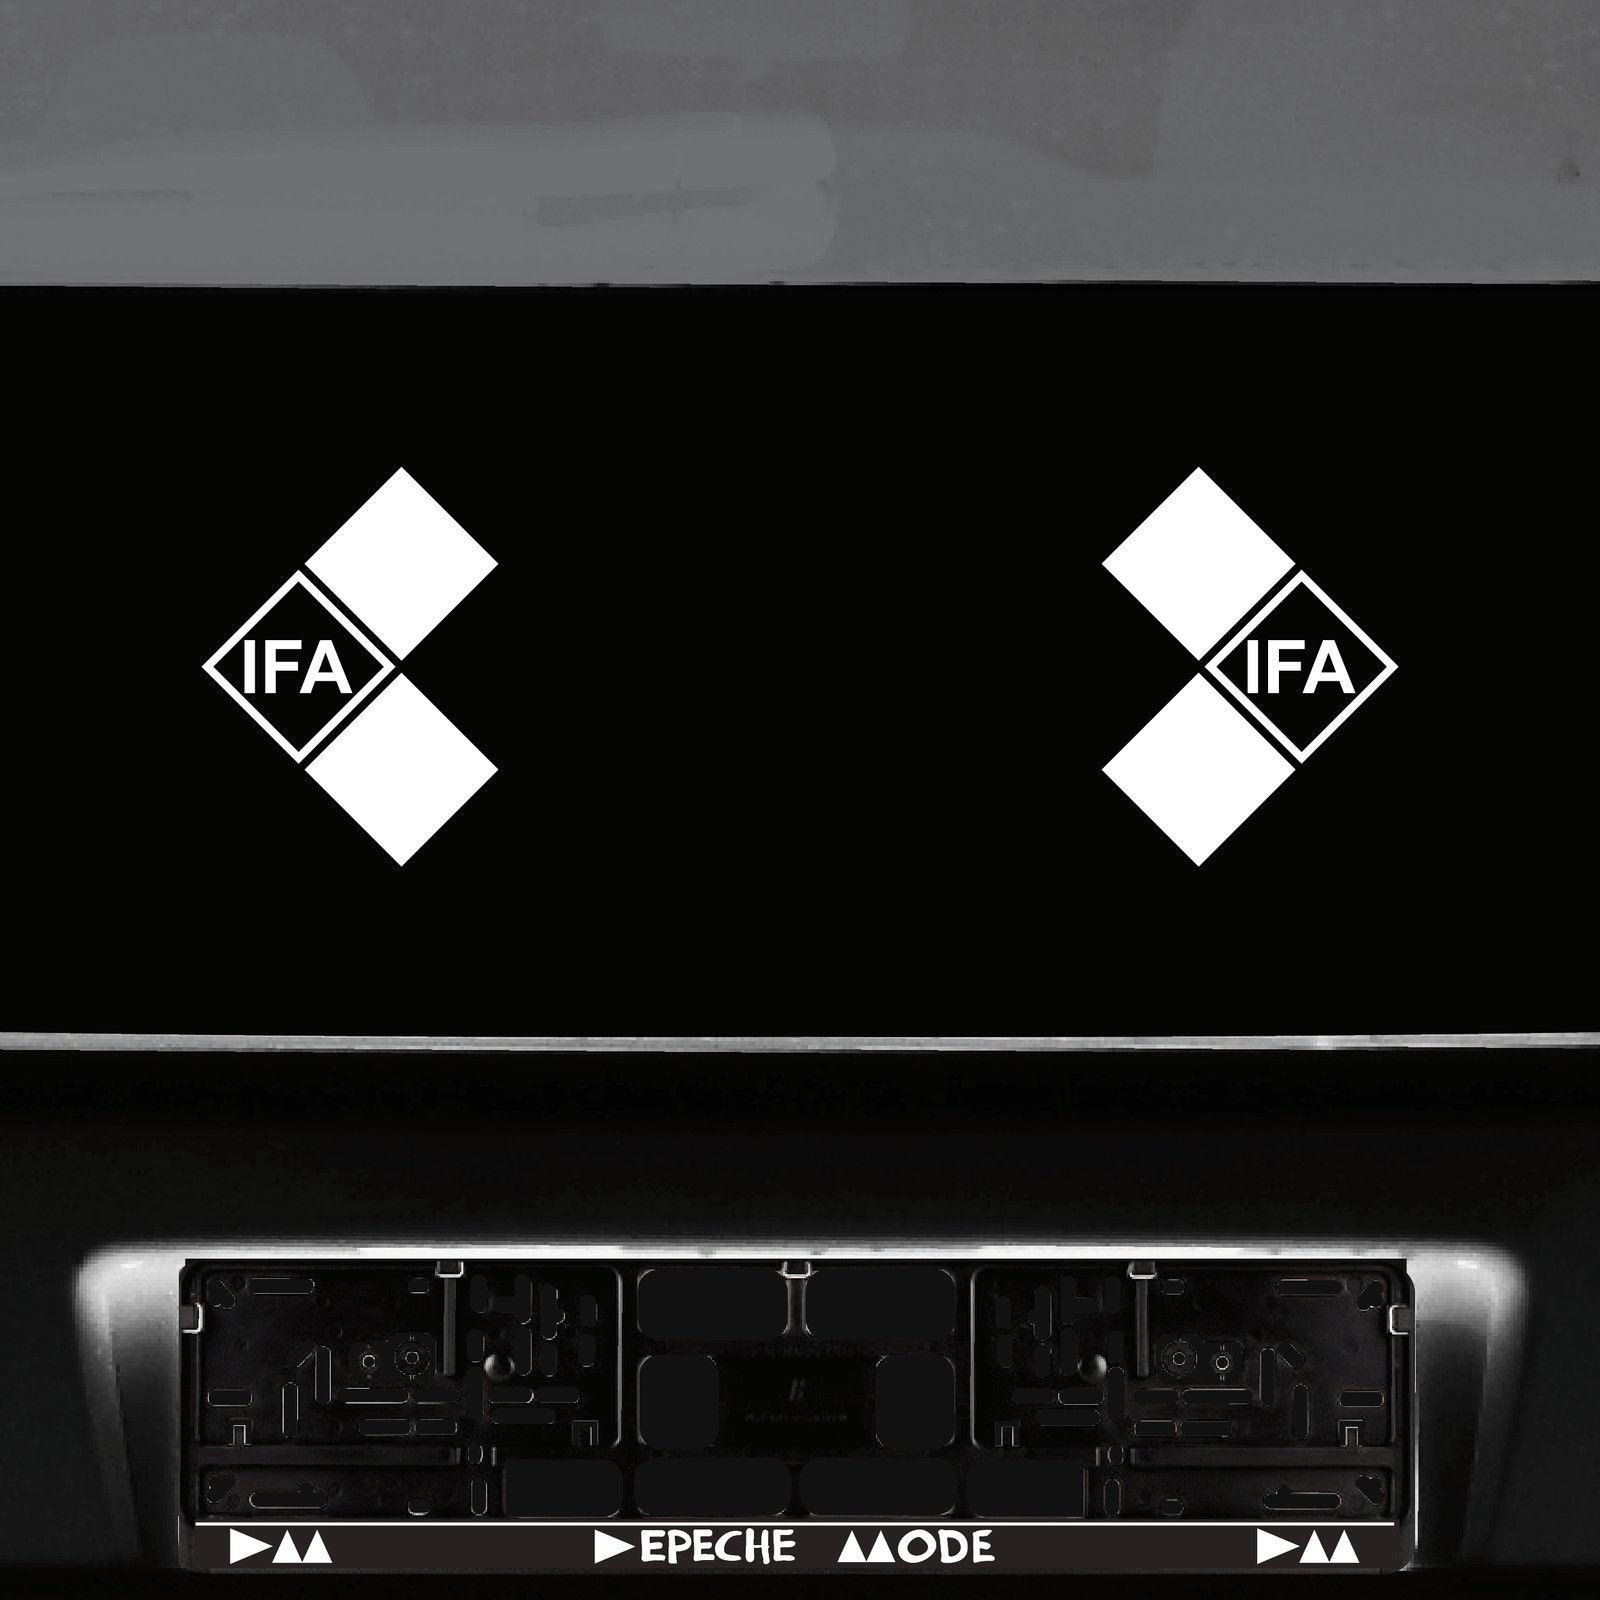 2 ifa symbole 15cm wei aufkleber tattoo auto folie ddr trabant simson wartburg kaufen bei. Black Bedroom Furniture Sets. Home Design Ideas